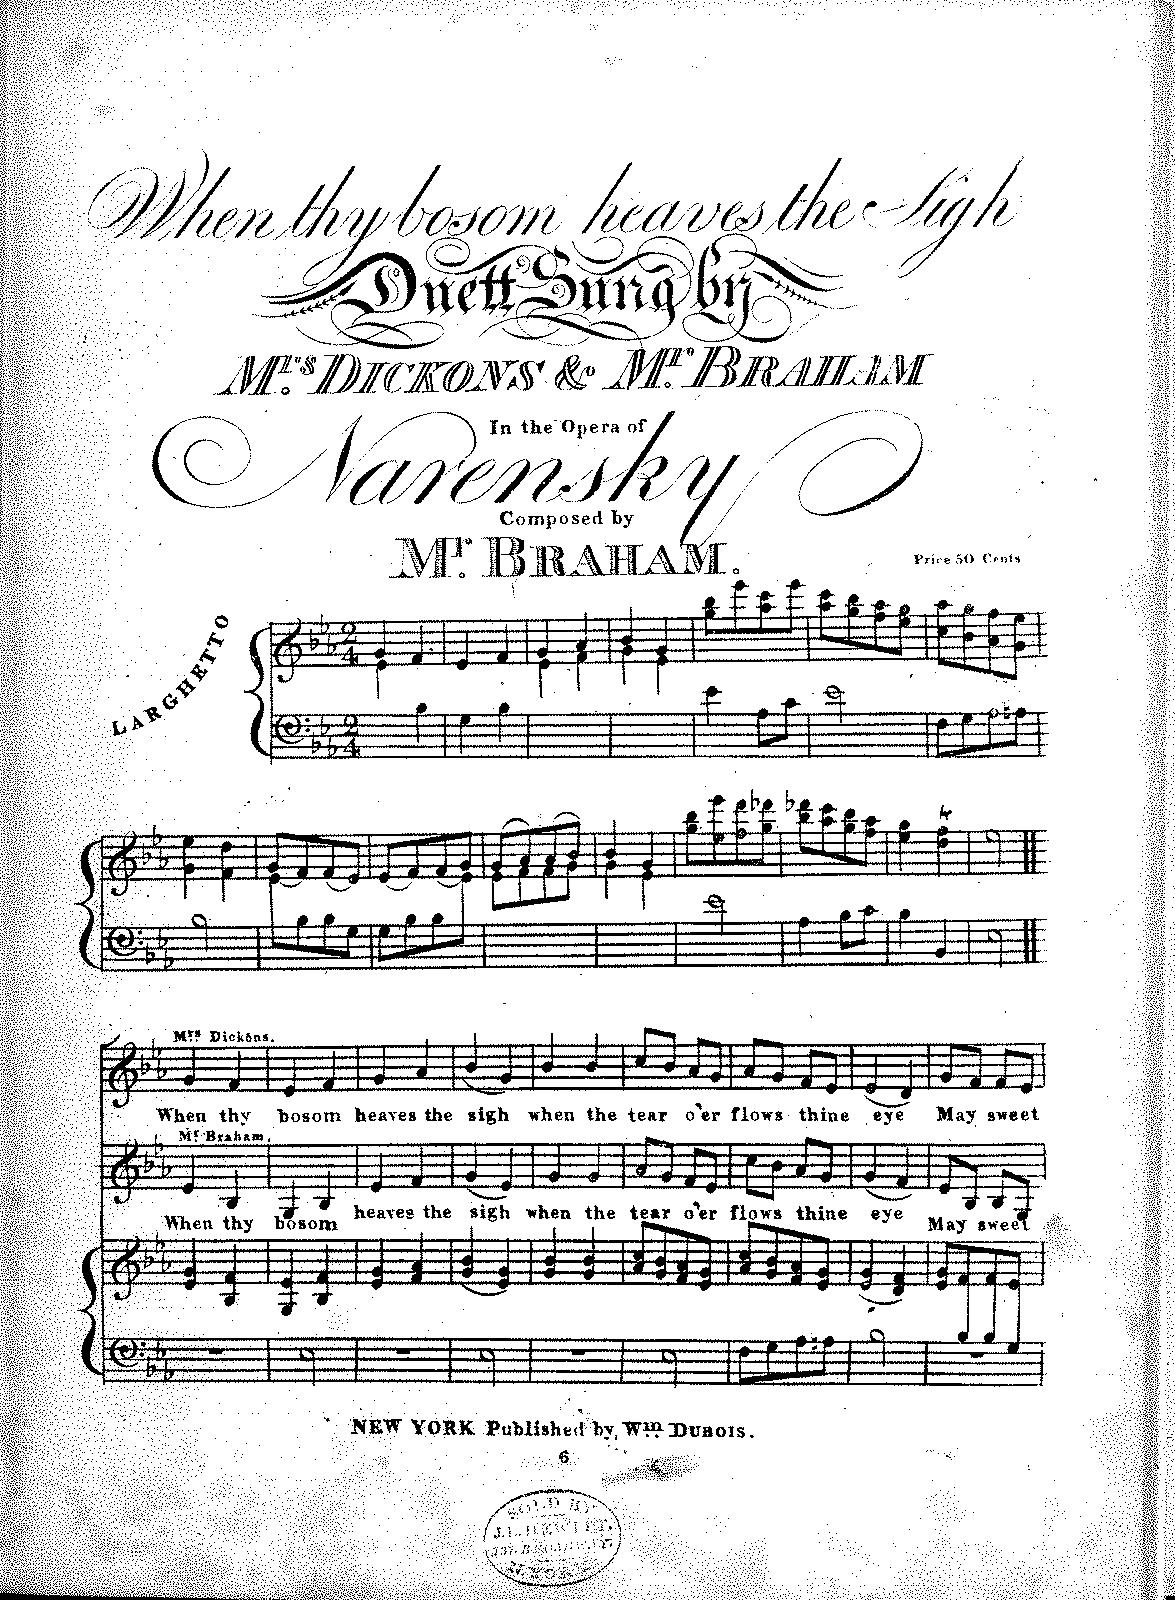 Narensky (Braham, John) - IMSLP/Petrucci Music Library: Free